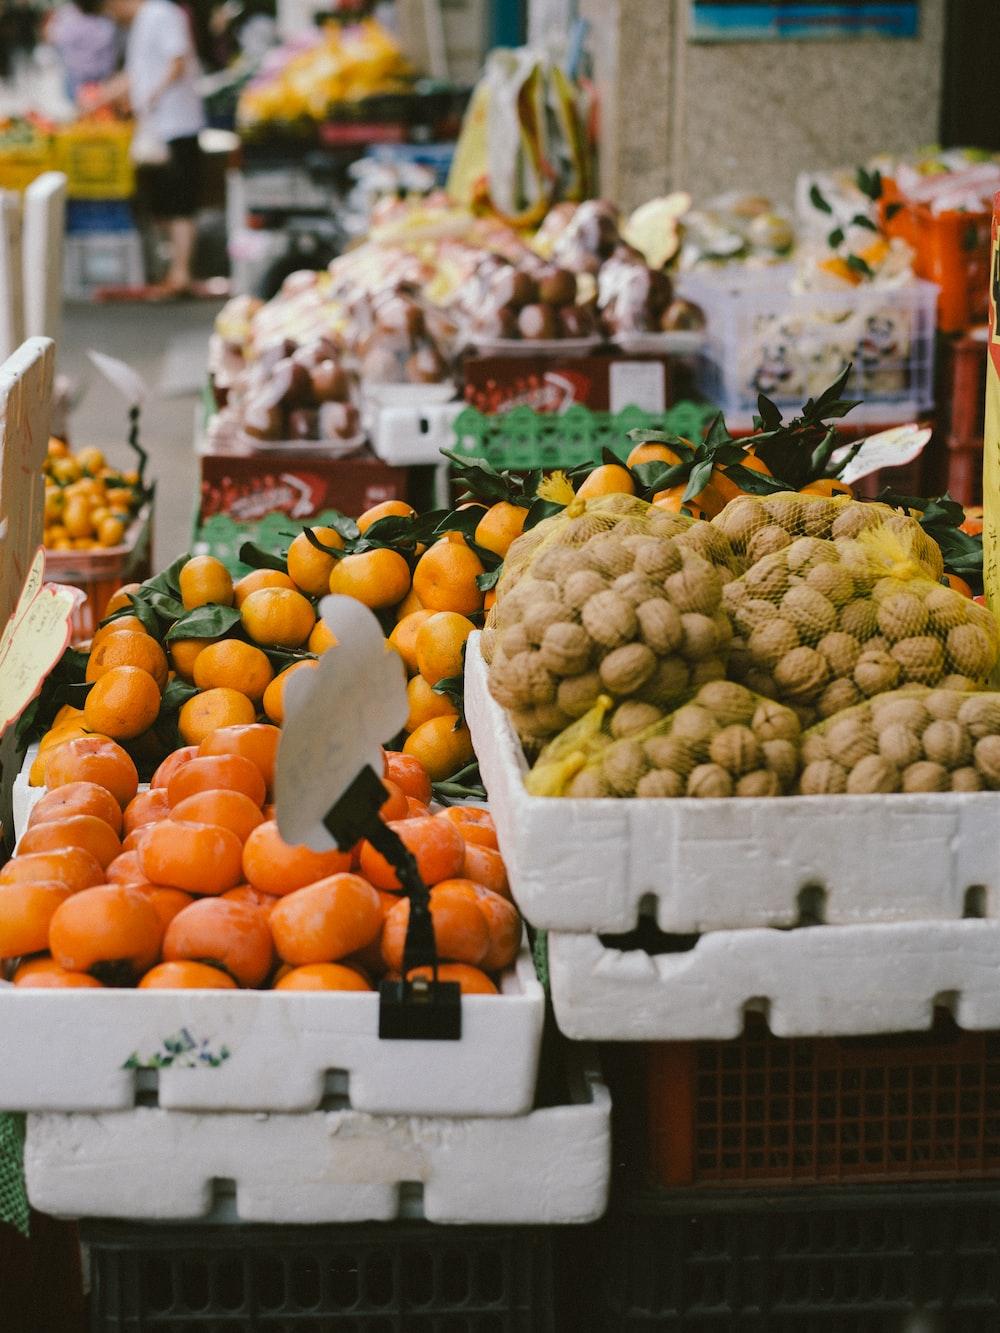 orange fruits on white plastic crate